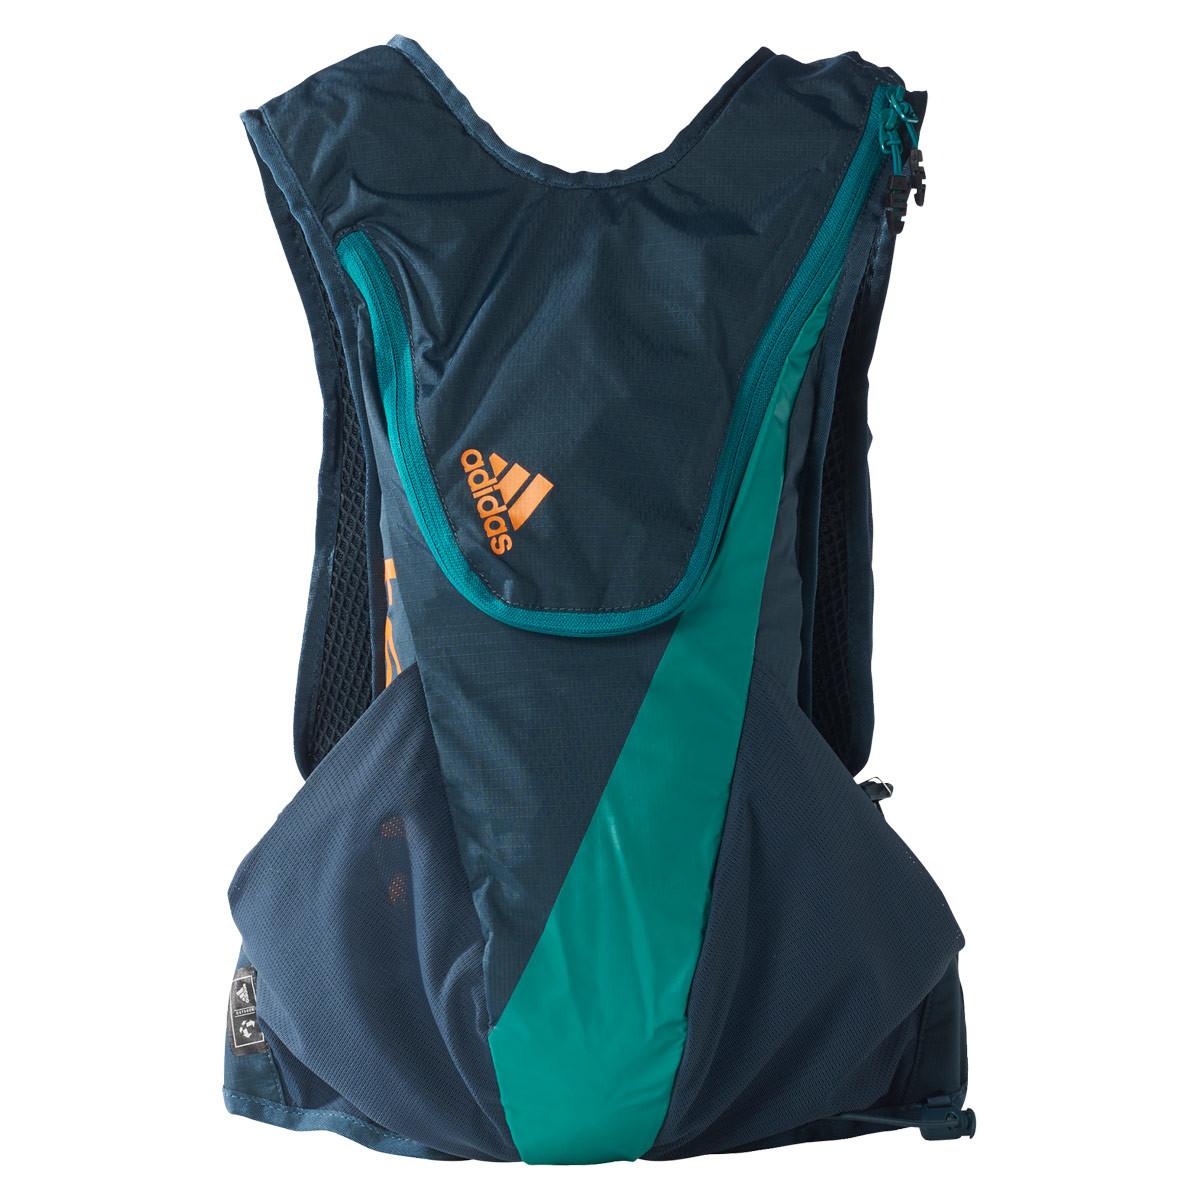 Verde Terrex Adidas Mochilas Speed Backpack 0wyO8vmNn